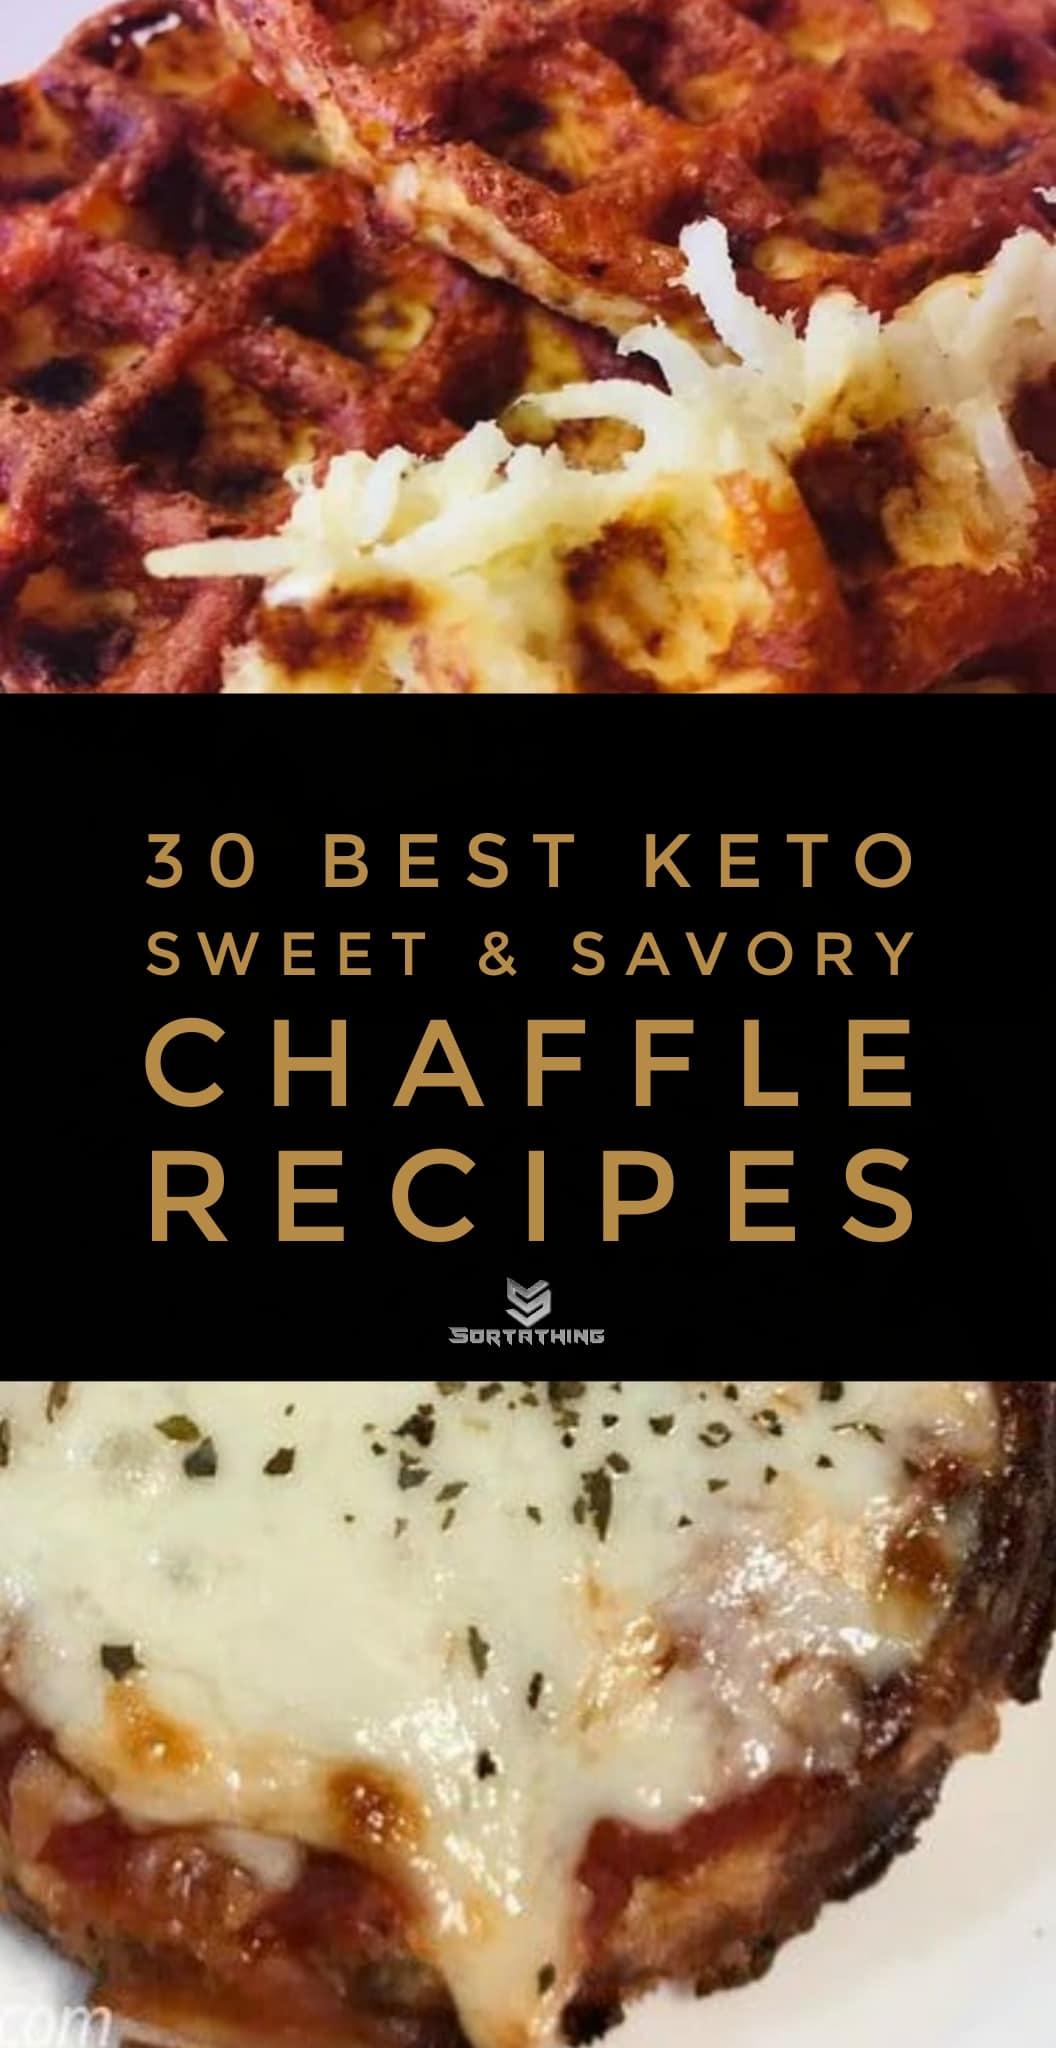 Jicama Hash Brown Chaffle & Chicken Parmesan Chaffle